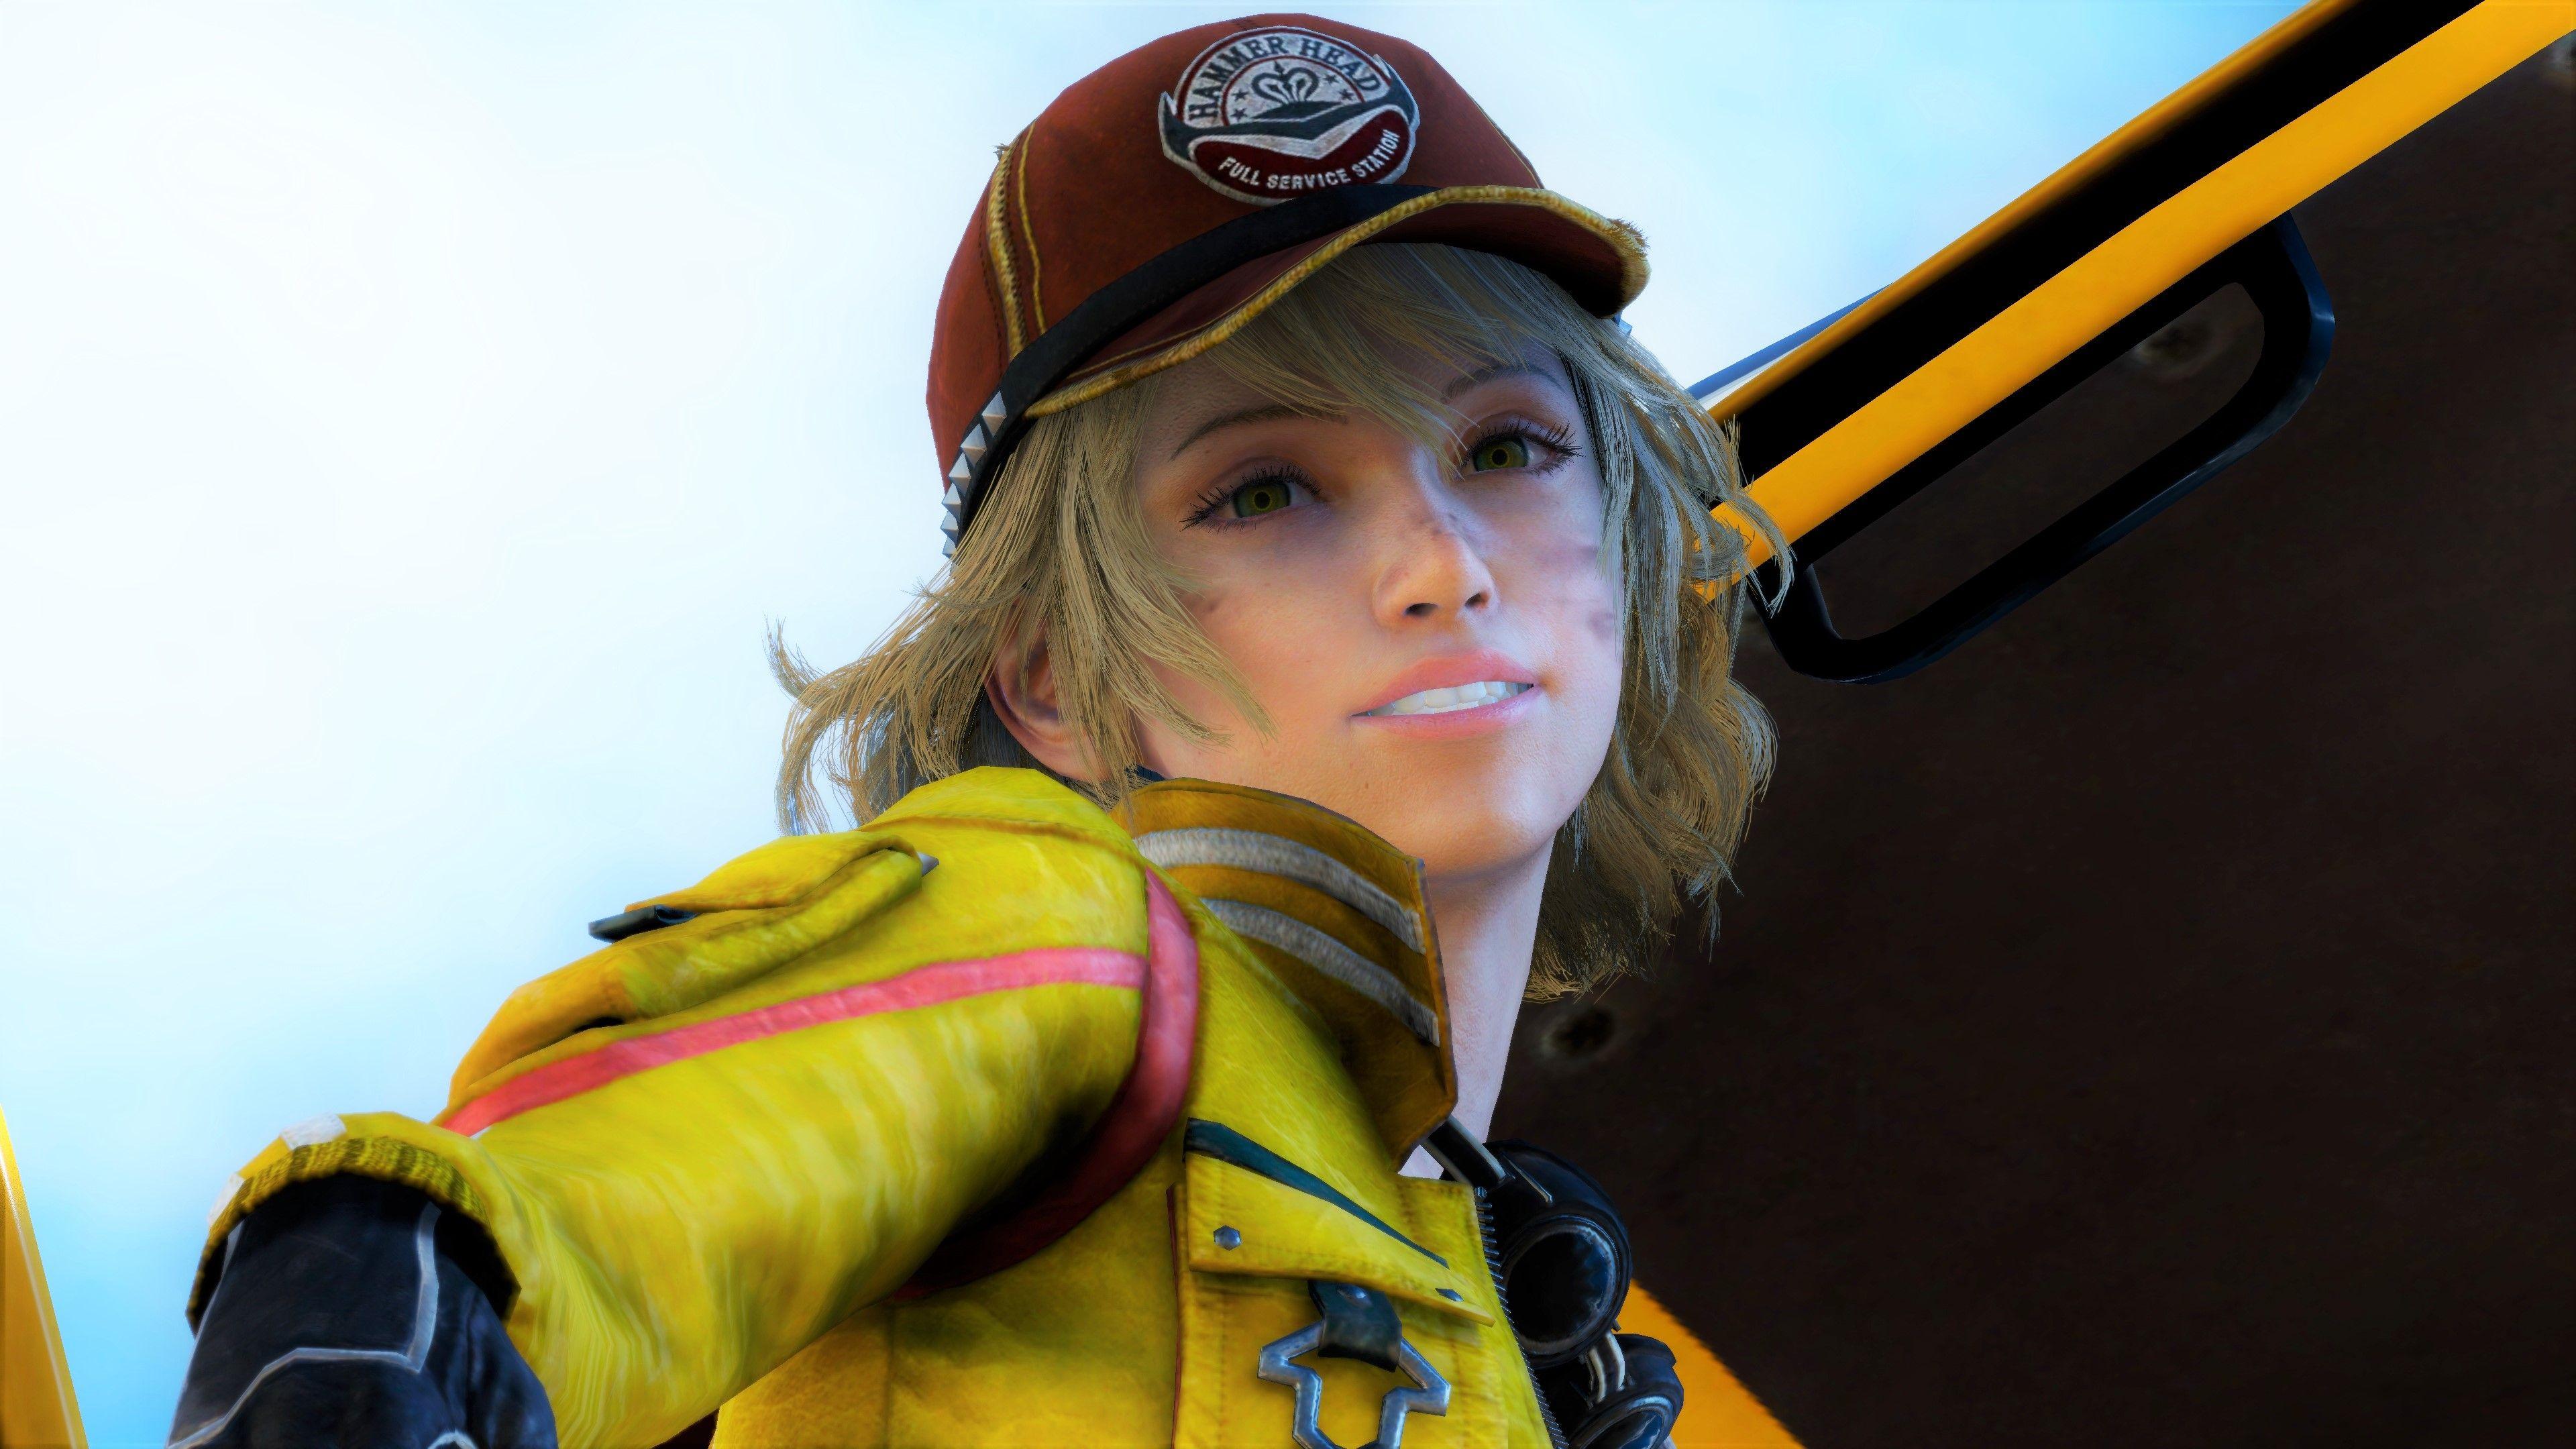 Final Fantasy Xv Windows Edition Cindy Aurum By Sncolors Cindy